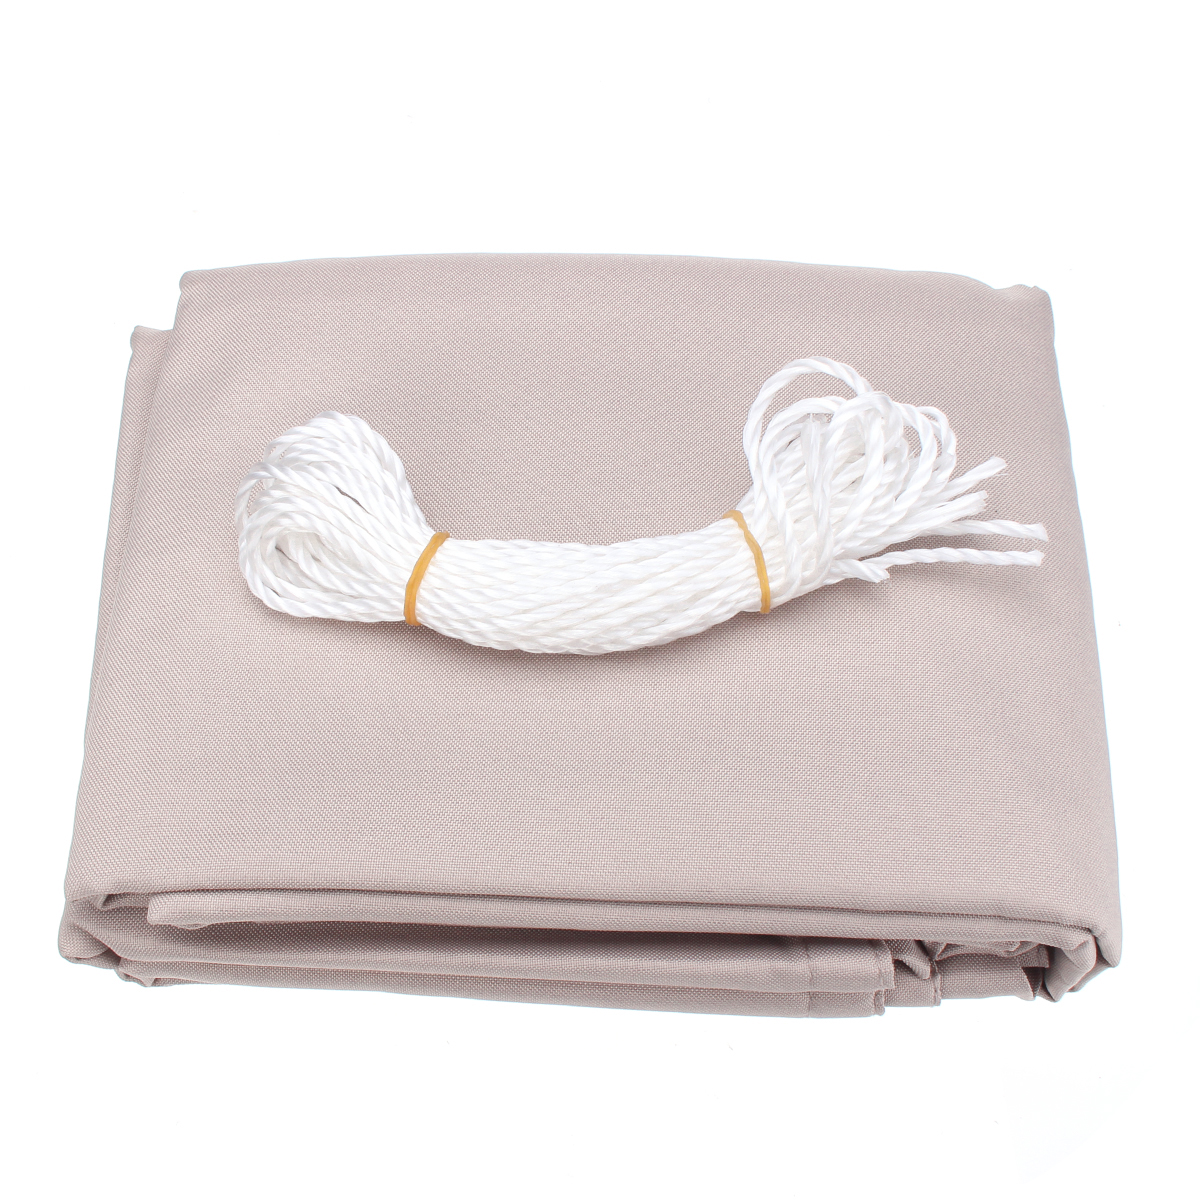 3M Sun Shade Sail Cloth Shadecloth Outdoor Canopy Patio Square Cover UV Block